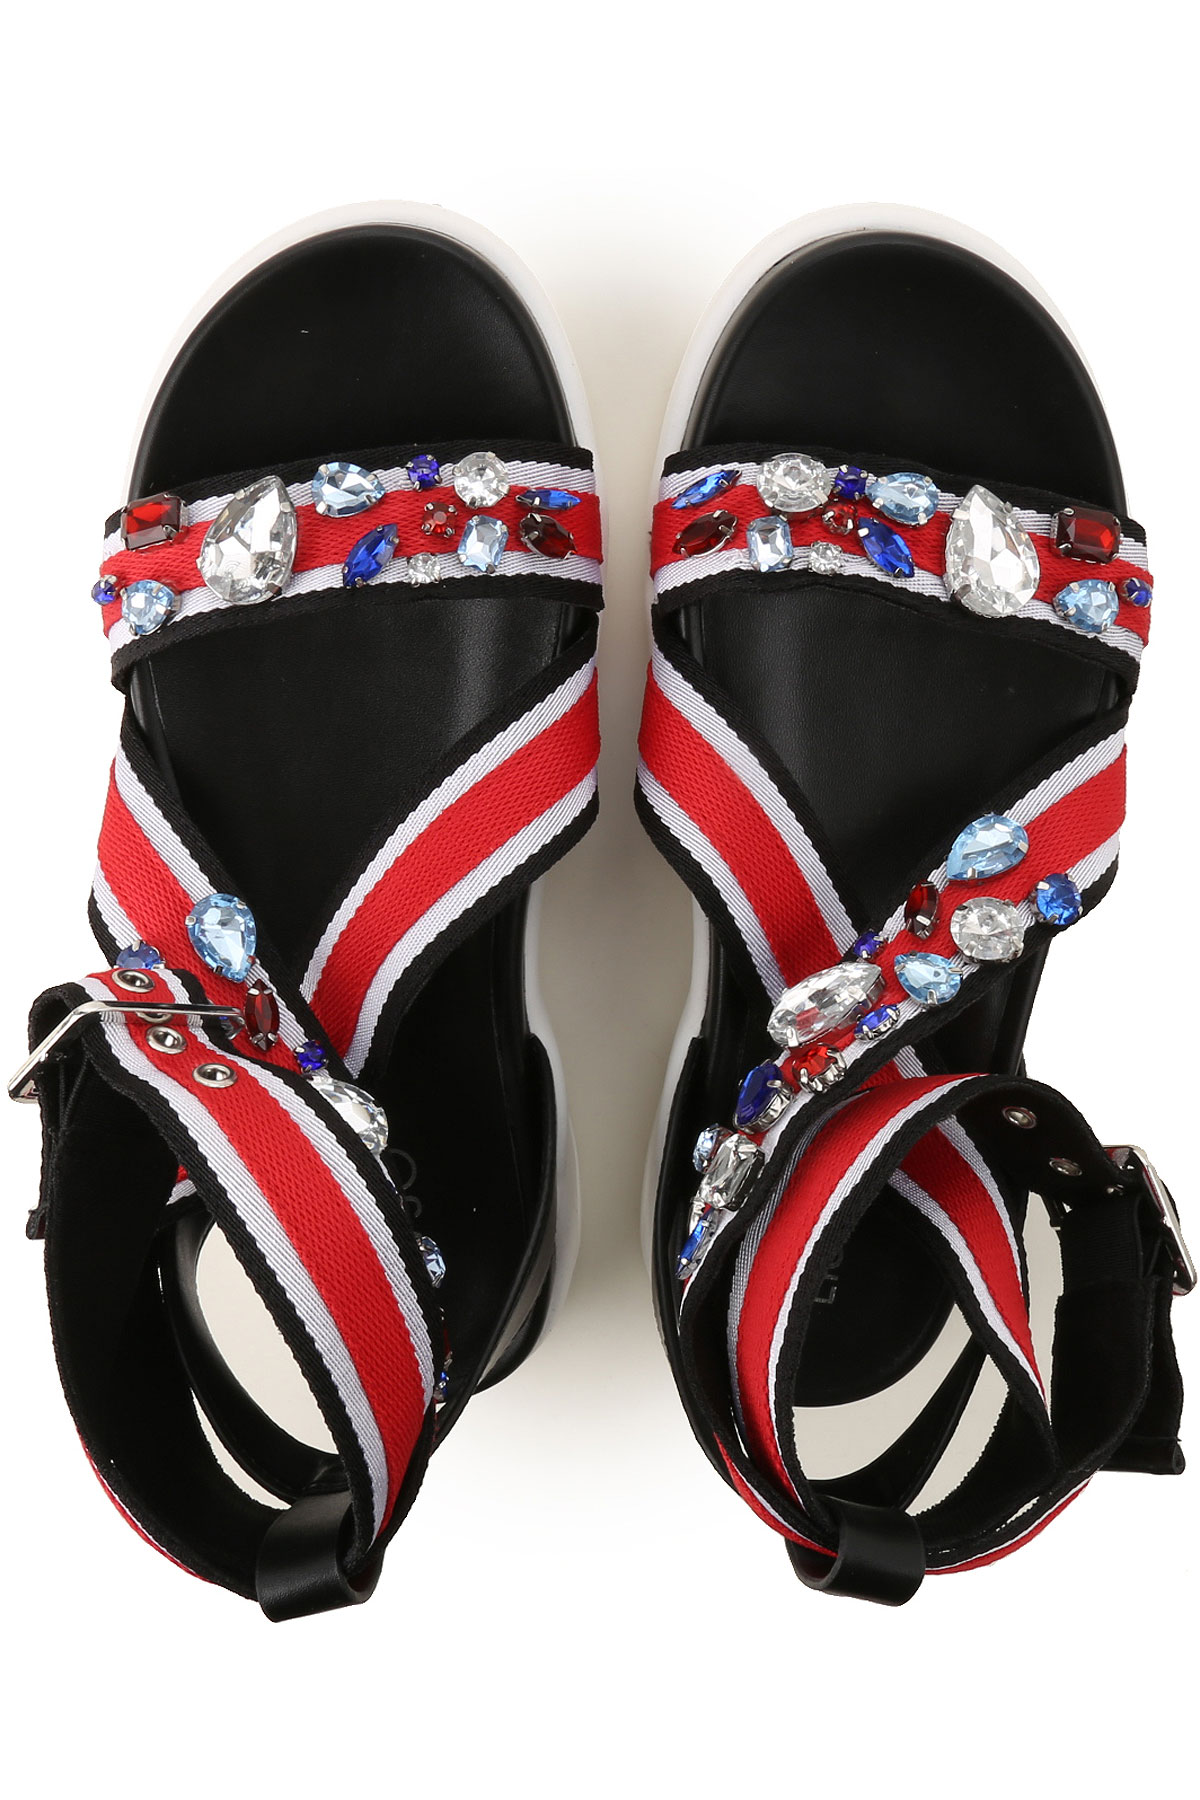 Para Zapatos Negro Mujer Primavera nbsp;blanco verano Rojo 2019 Liu Jo O4HqWAc6